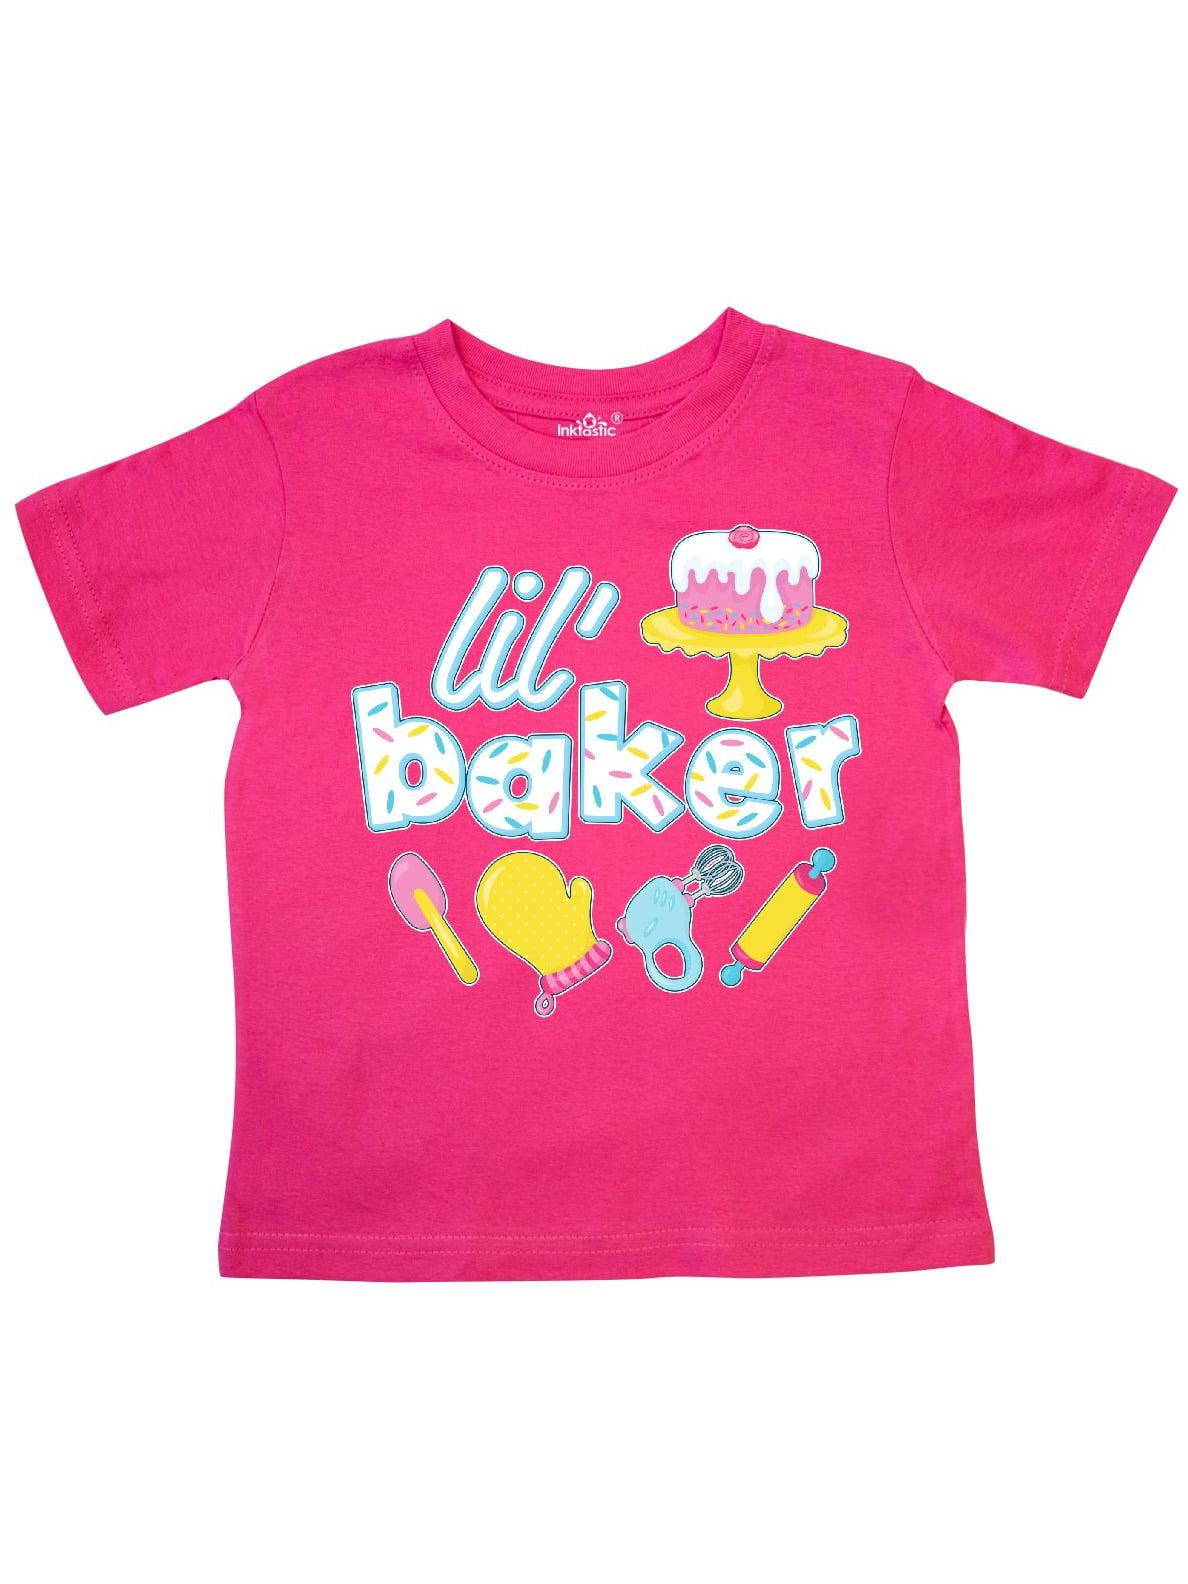 inktastic Bake It Baker Toddler T-Shirt